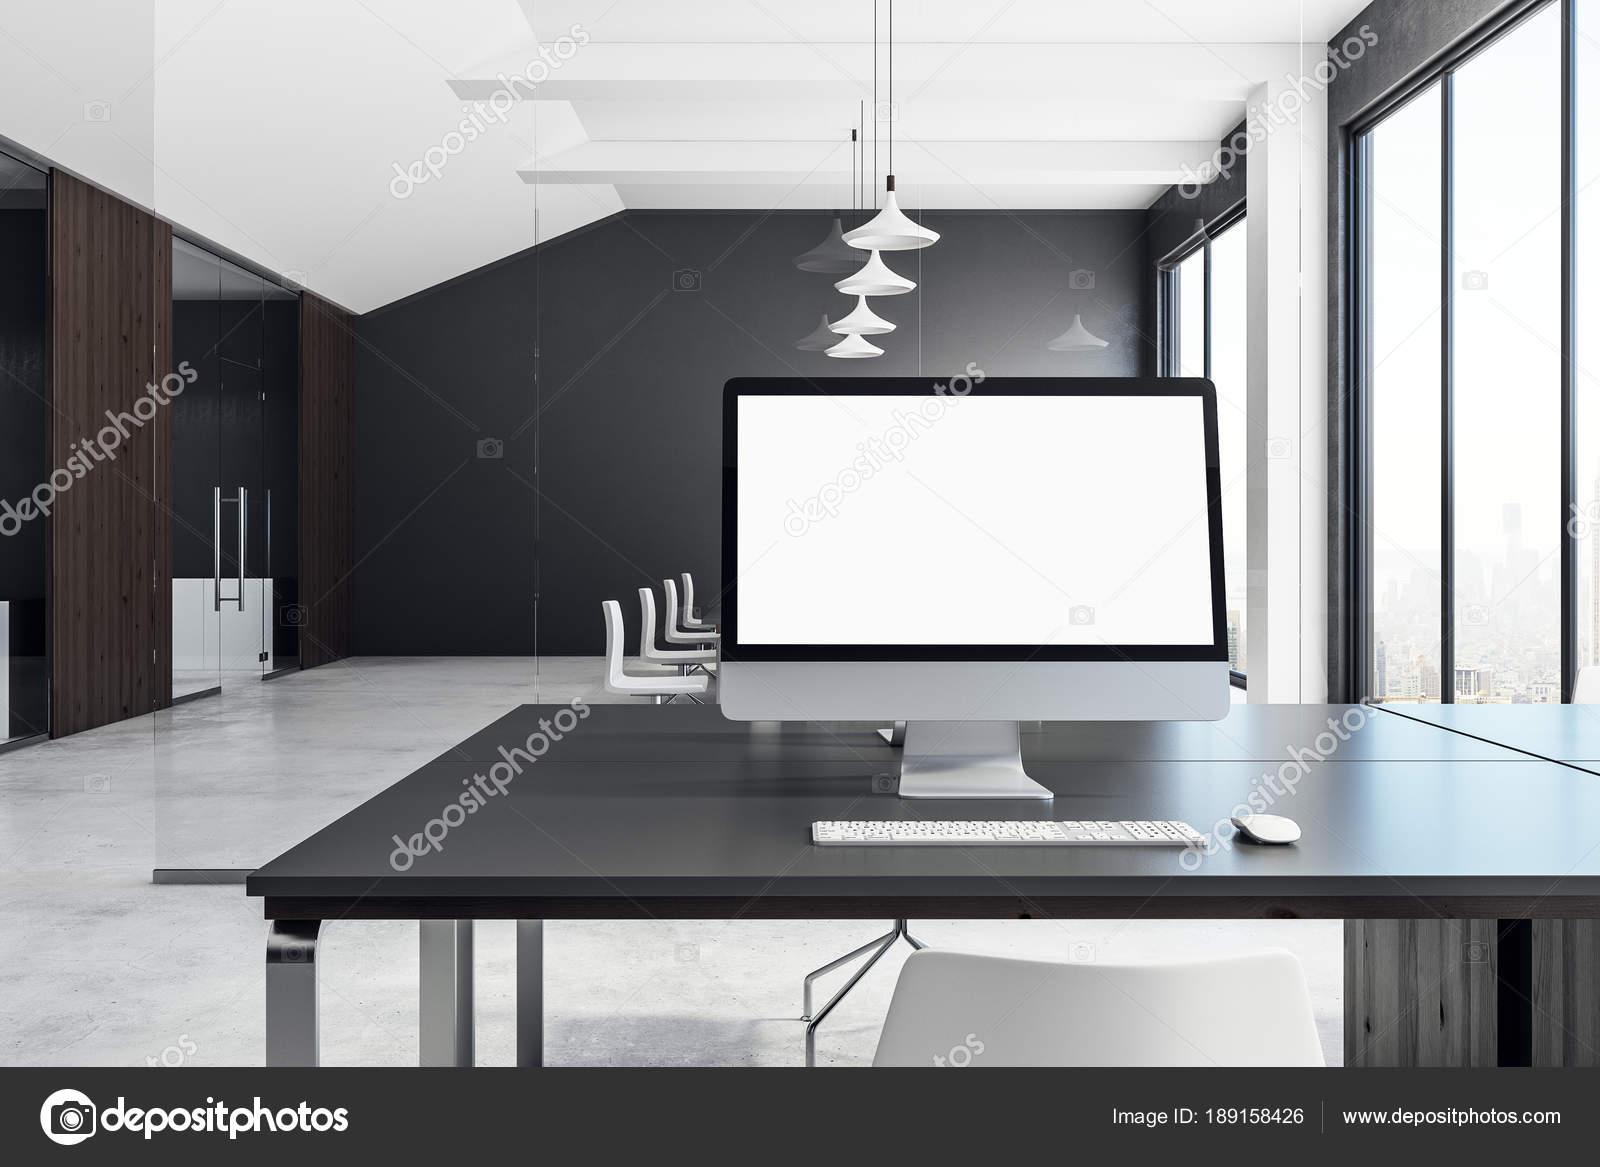 Vide blanc ordinateur de bureau contemporain u2014 photographie peshkova